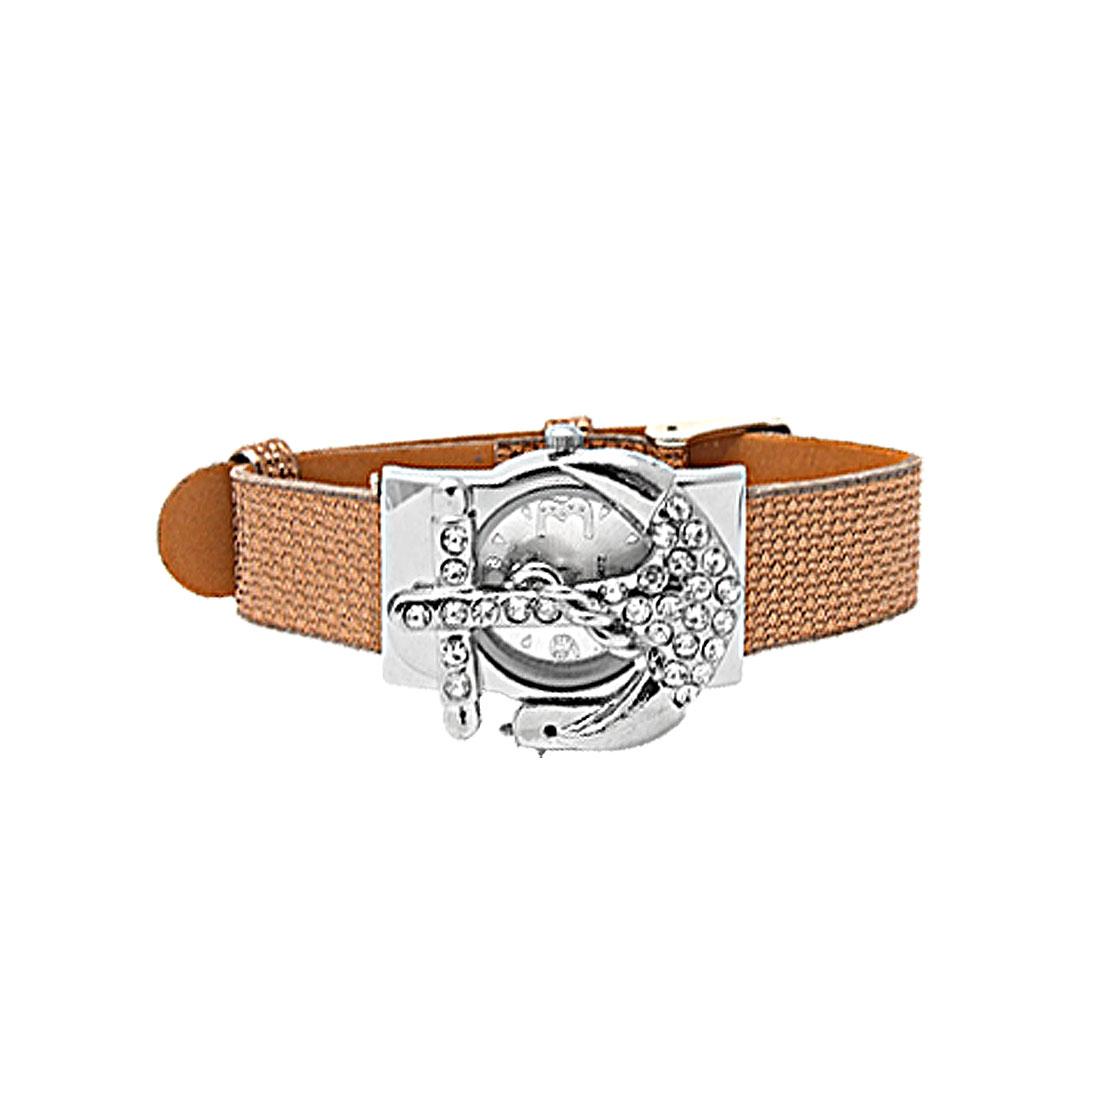 Fashion Jewelry Brown Leather Band Rhinestone Peltate Watch